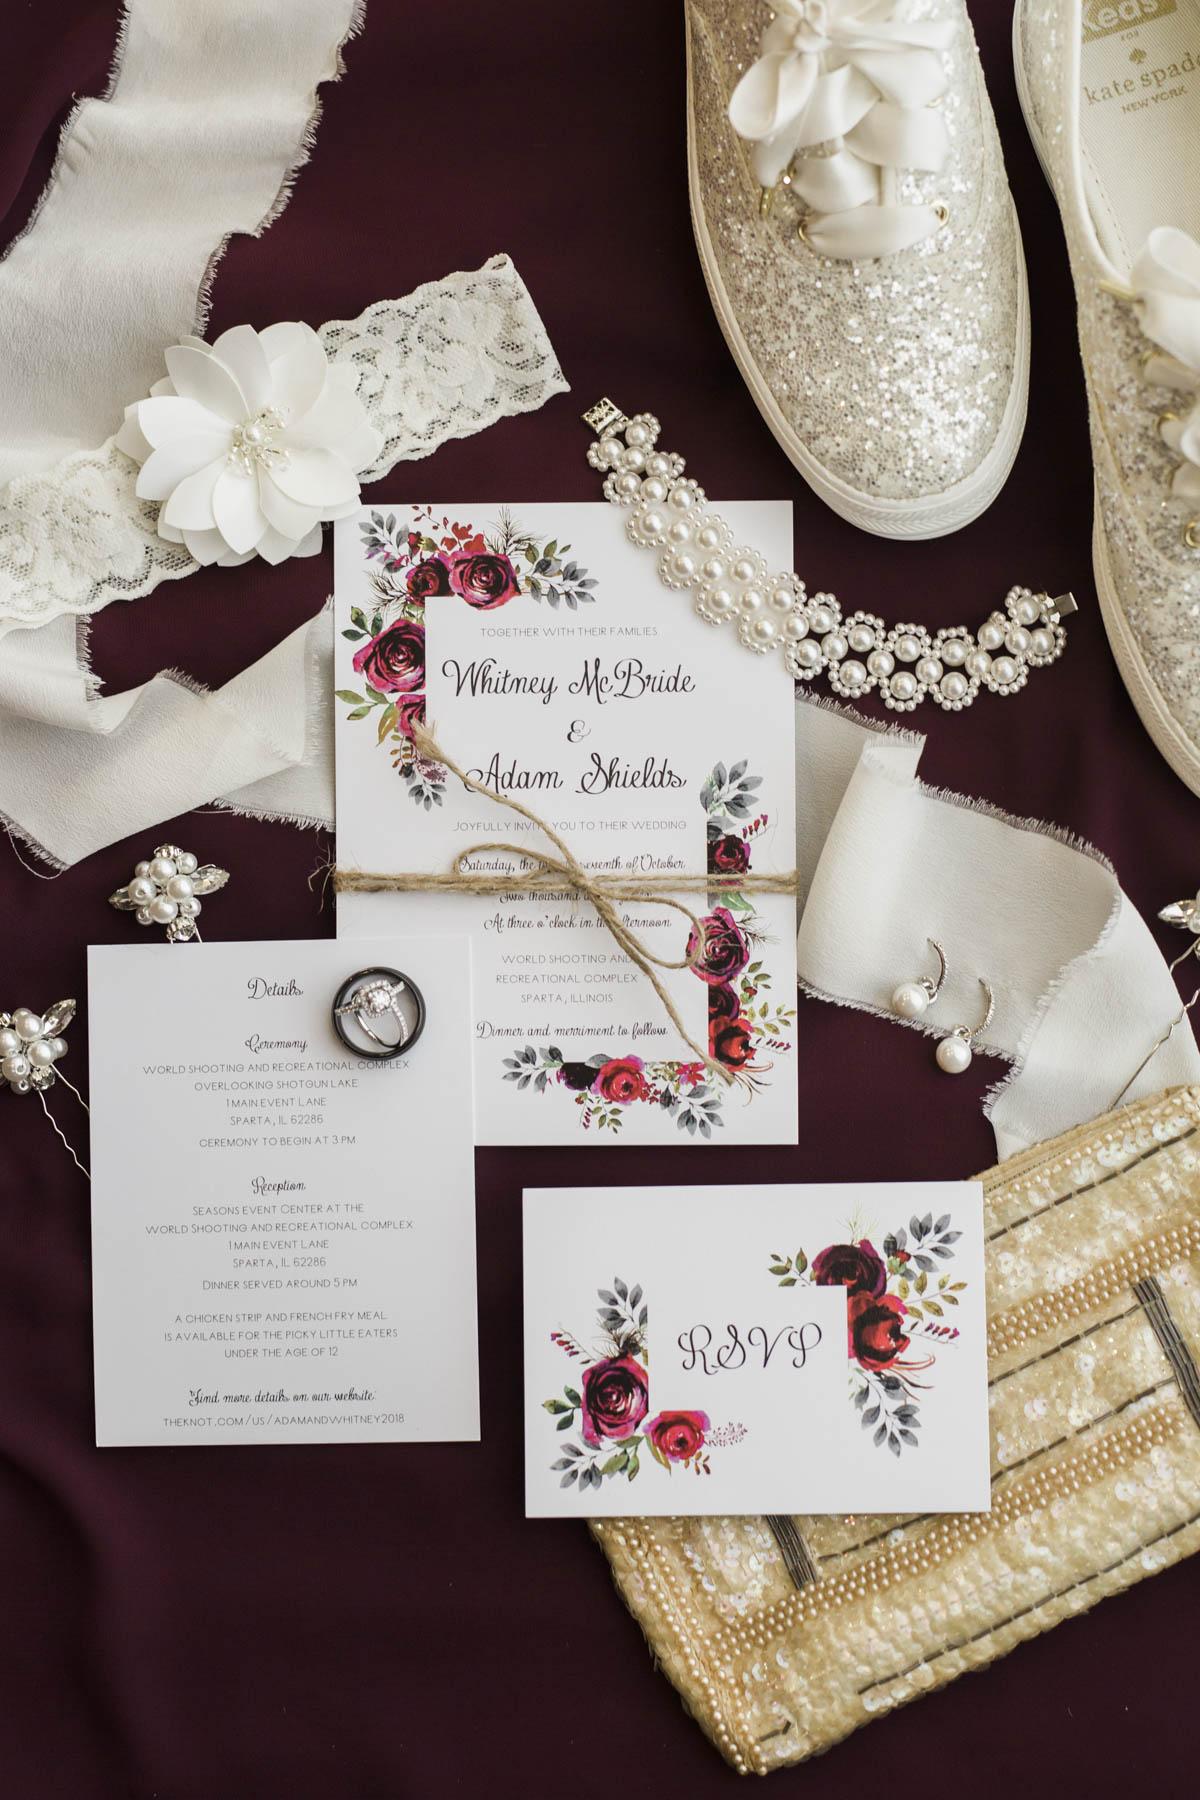 shotbychelsea_blog_wedding-2.jpg